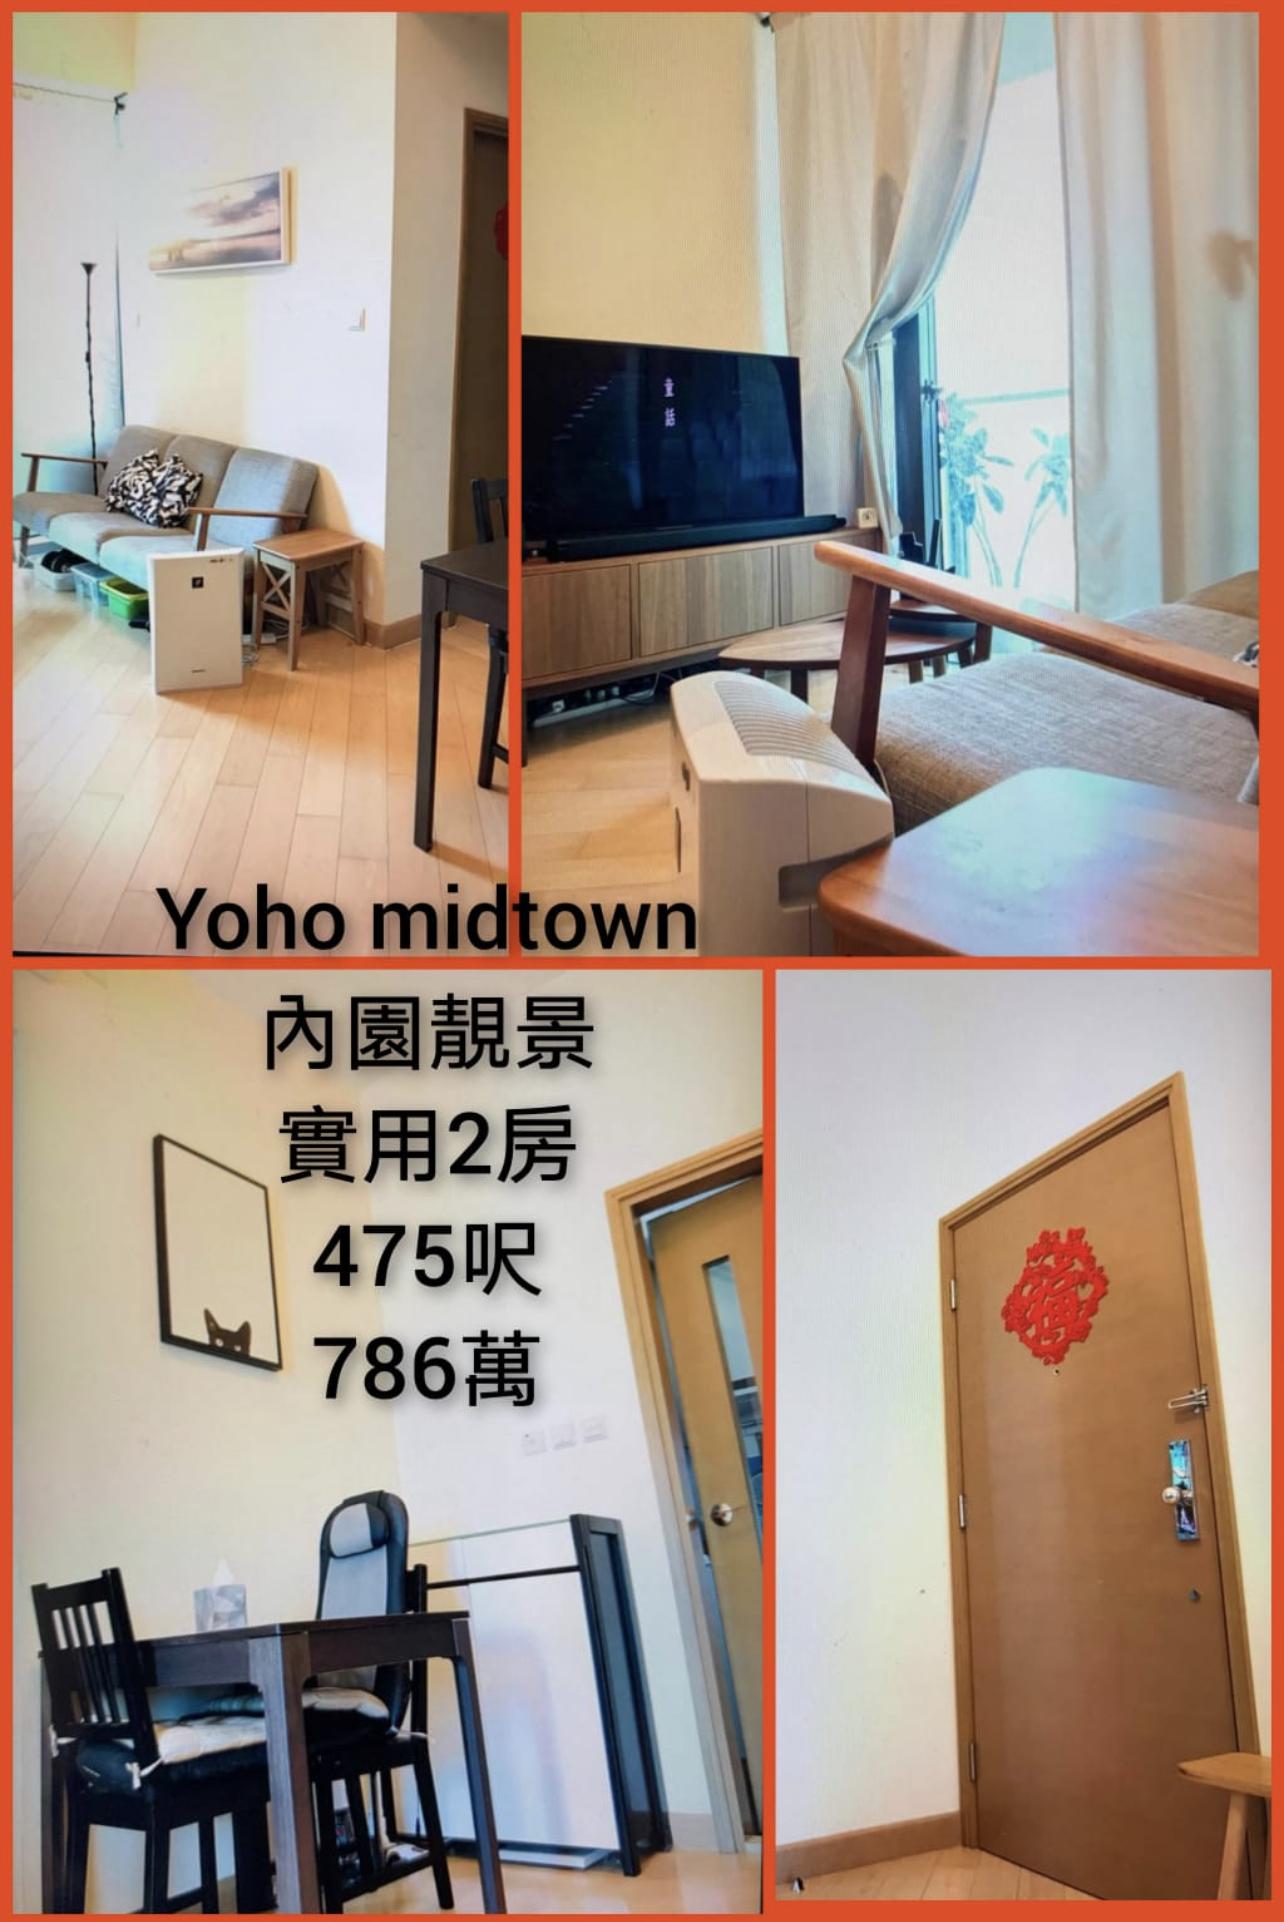 YoHo midtown 難得高層內園兩房筍野✅